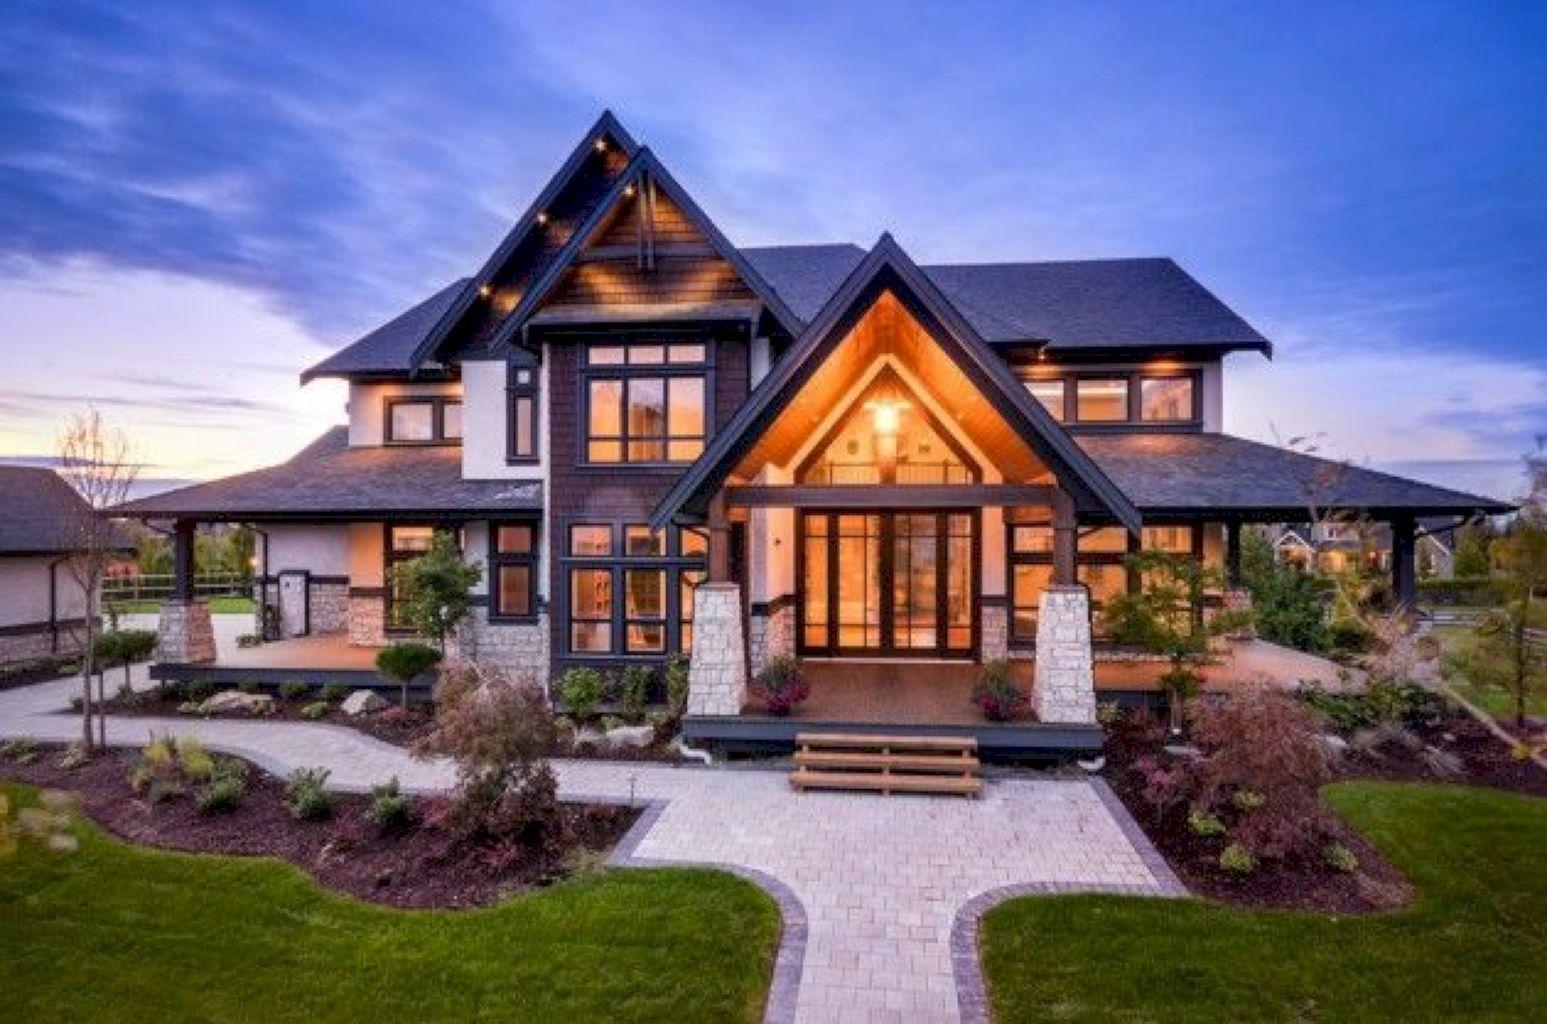 46 stunning modern farmhouse exterior design ideas house